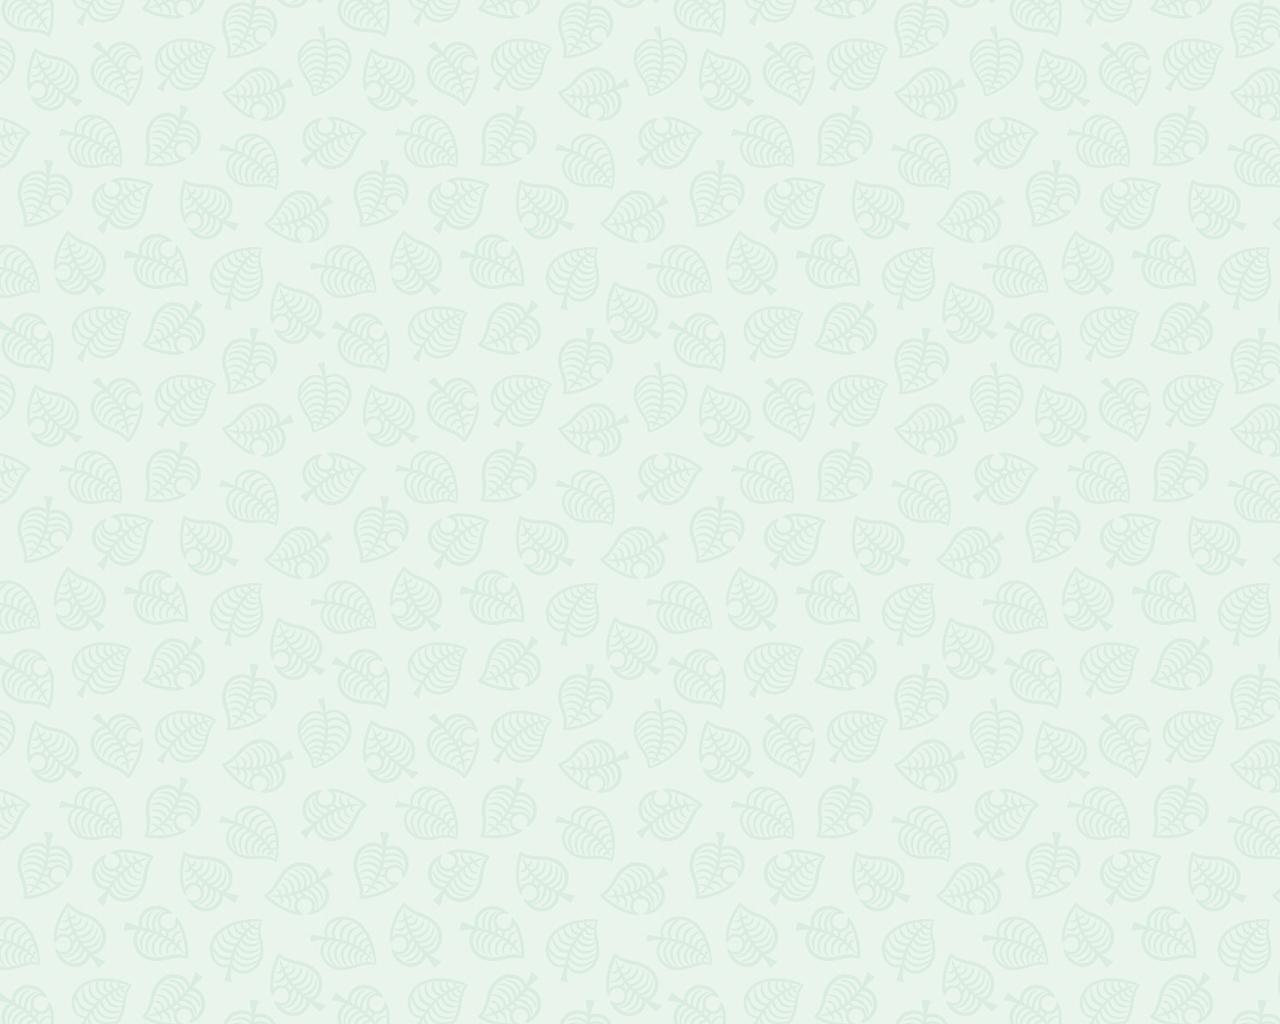 Animal Crossing New Horizons Leaf Pattern Version 2 Wallpaper